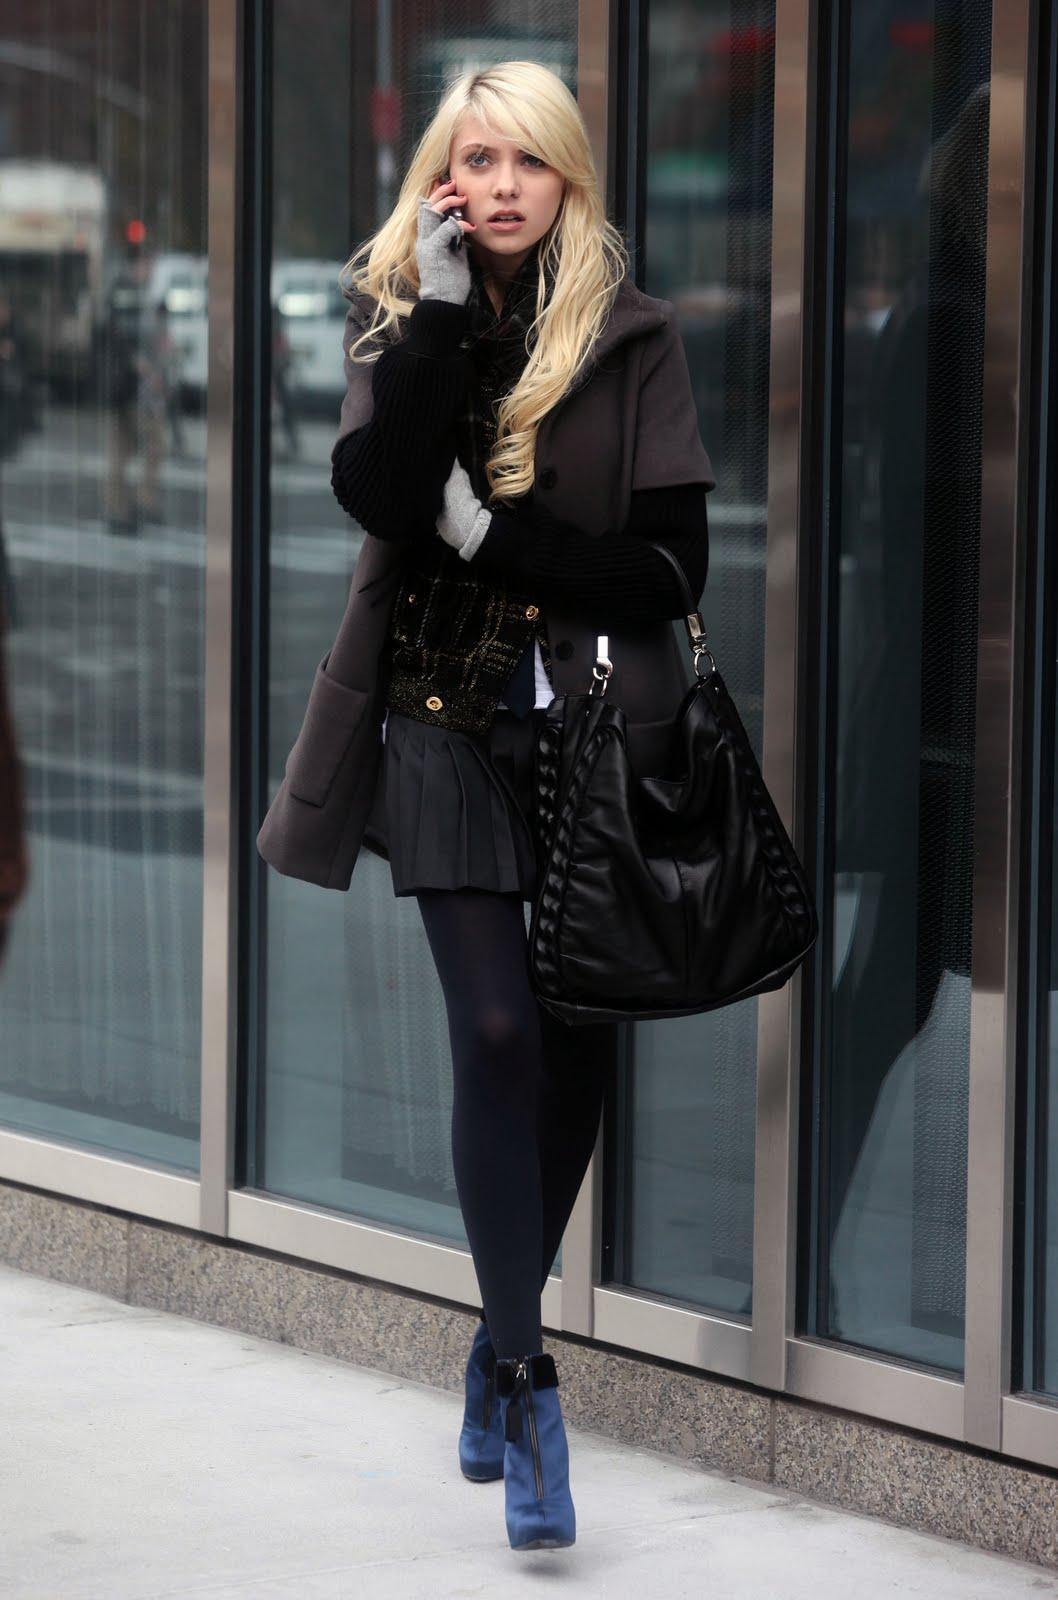 http://2.bp.blogspot.com/-Gtov0-ZK0LU/TsCPSQp-NWI/AAAAAAAACuE/Jg6DJSkFvbg/s1600/Taylor+Momsen+Gossip+Girl+set+HQ+%25288%2529.jpg